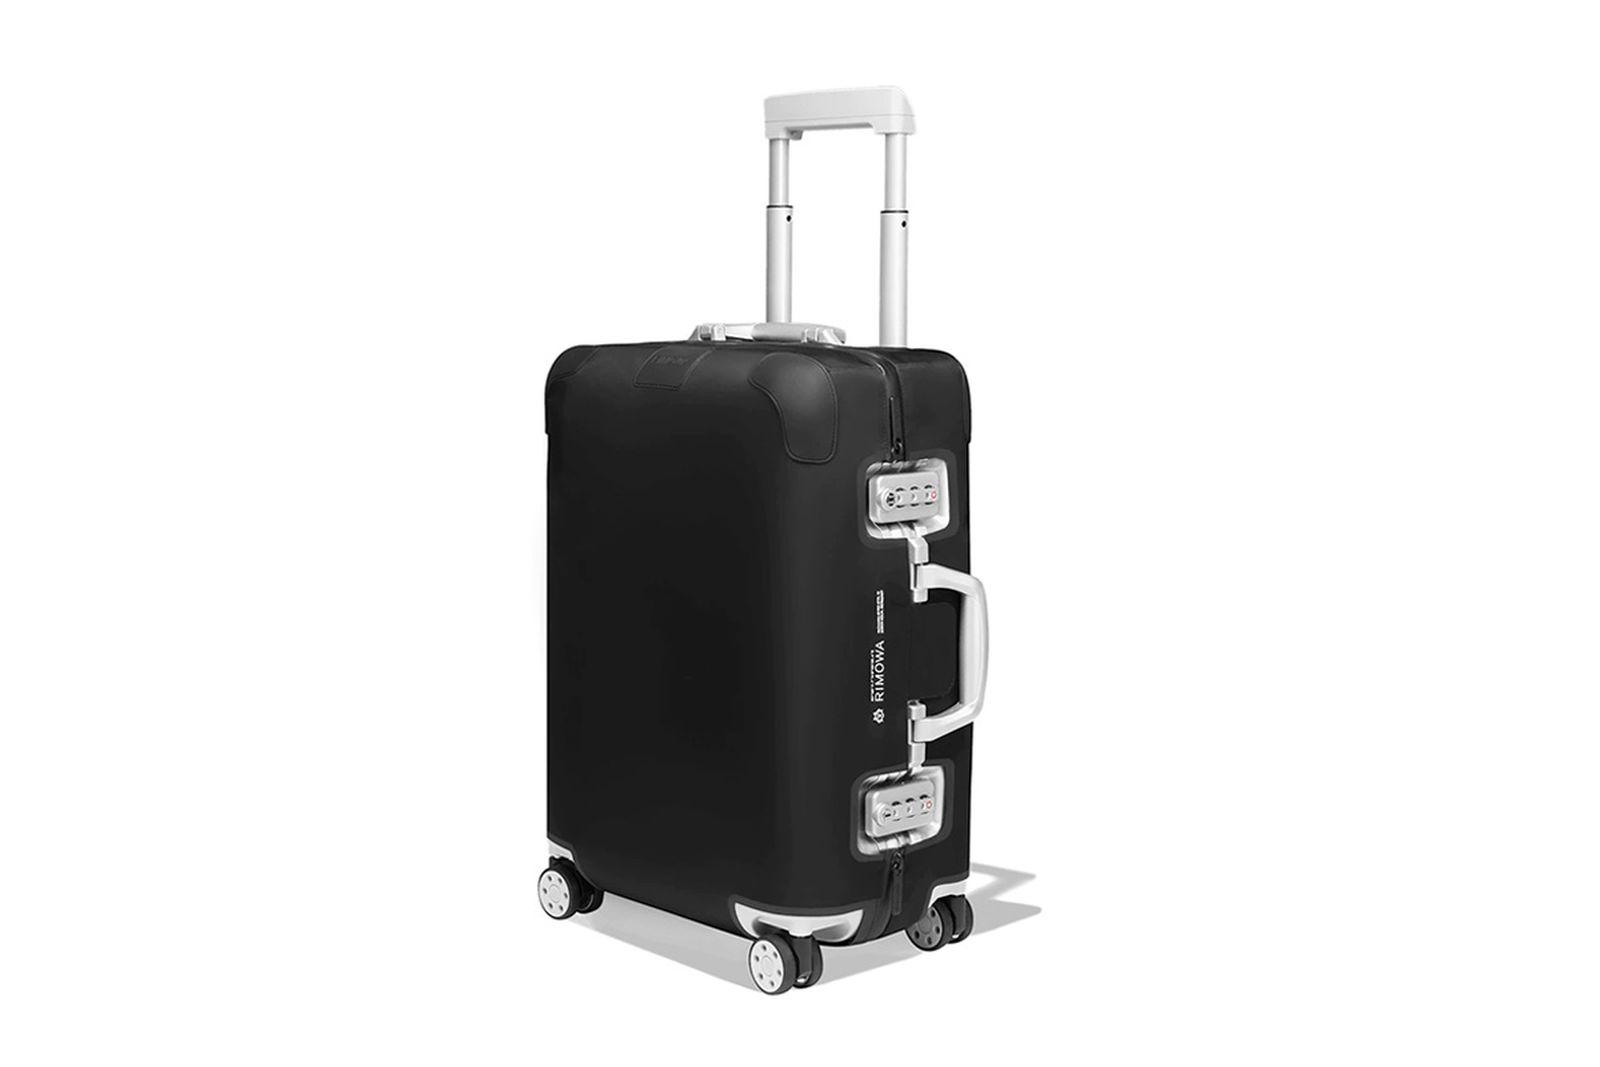 rimowa-luggage-suitcase-cover-04